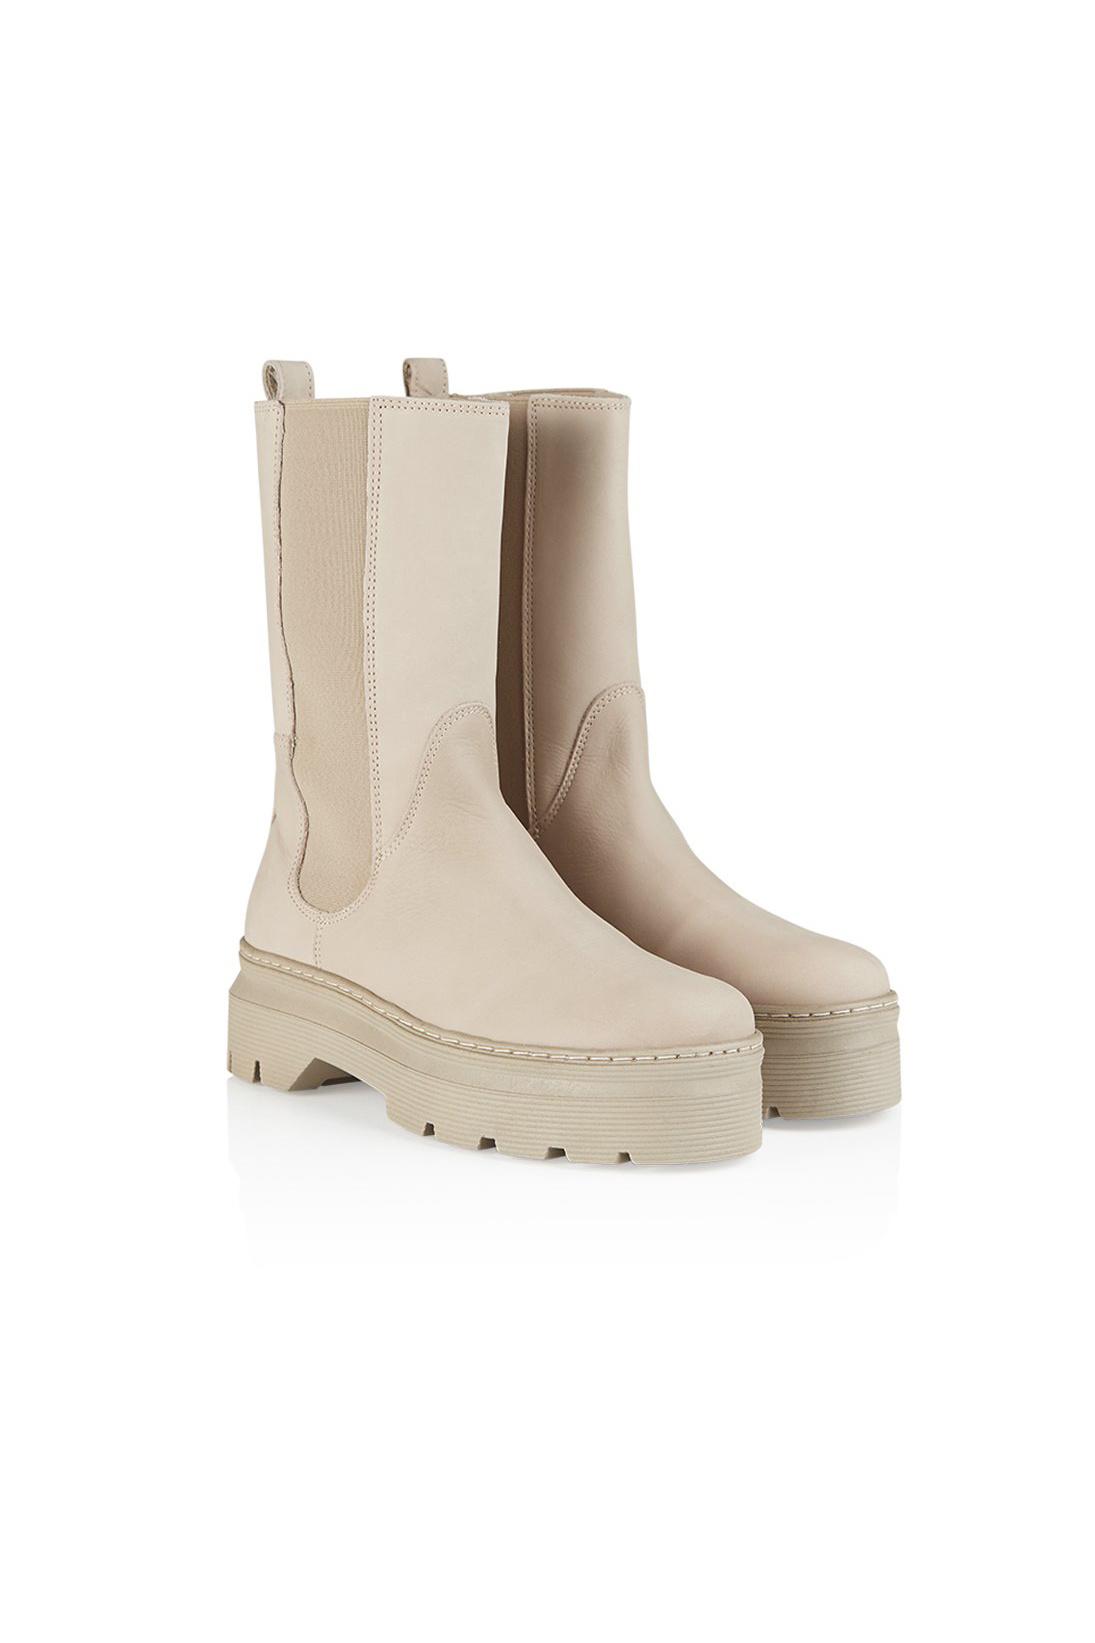 Aya Nubuck Boot - Nude-2